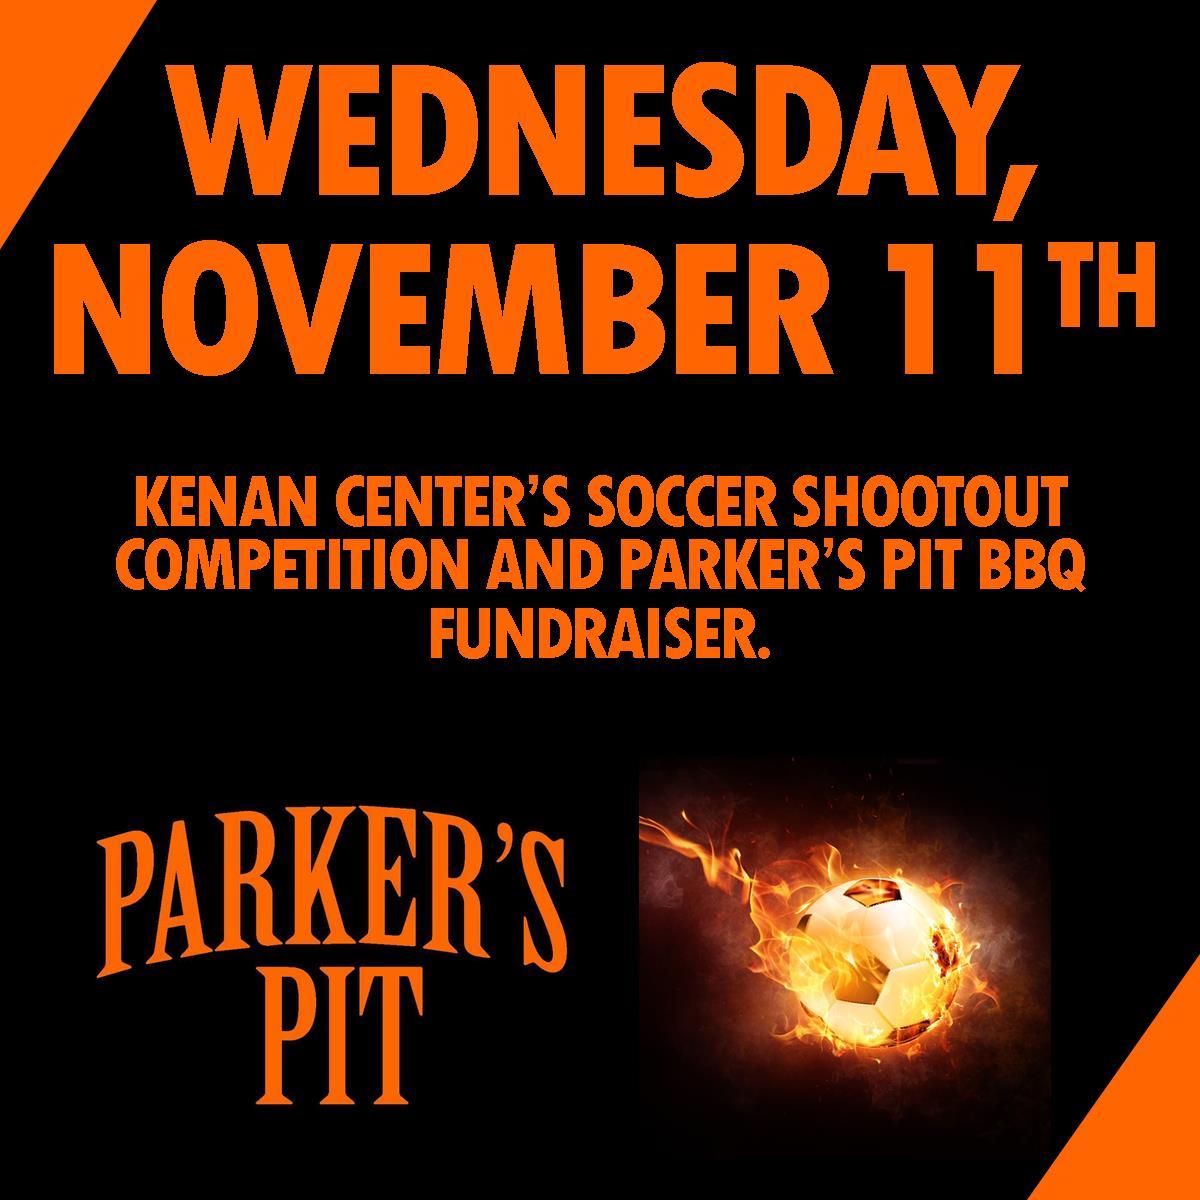 Parker's Pit Drive Thru BBQ & Soccer Shootout